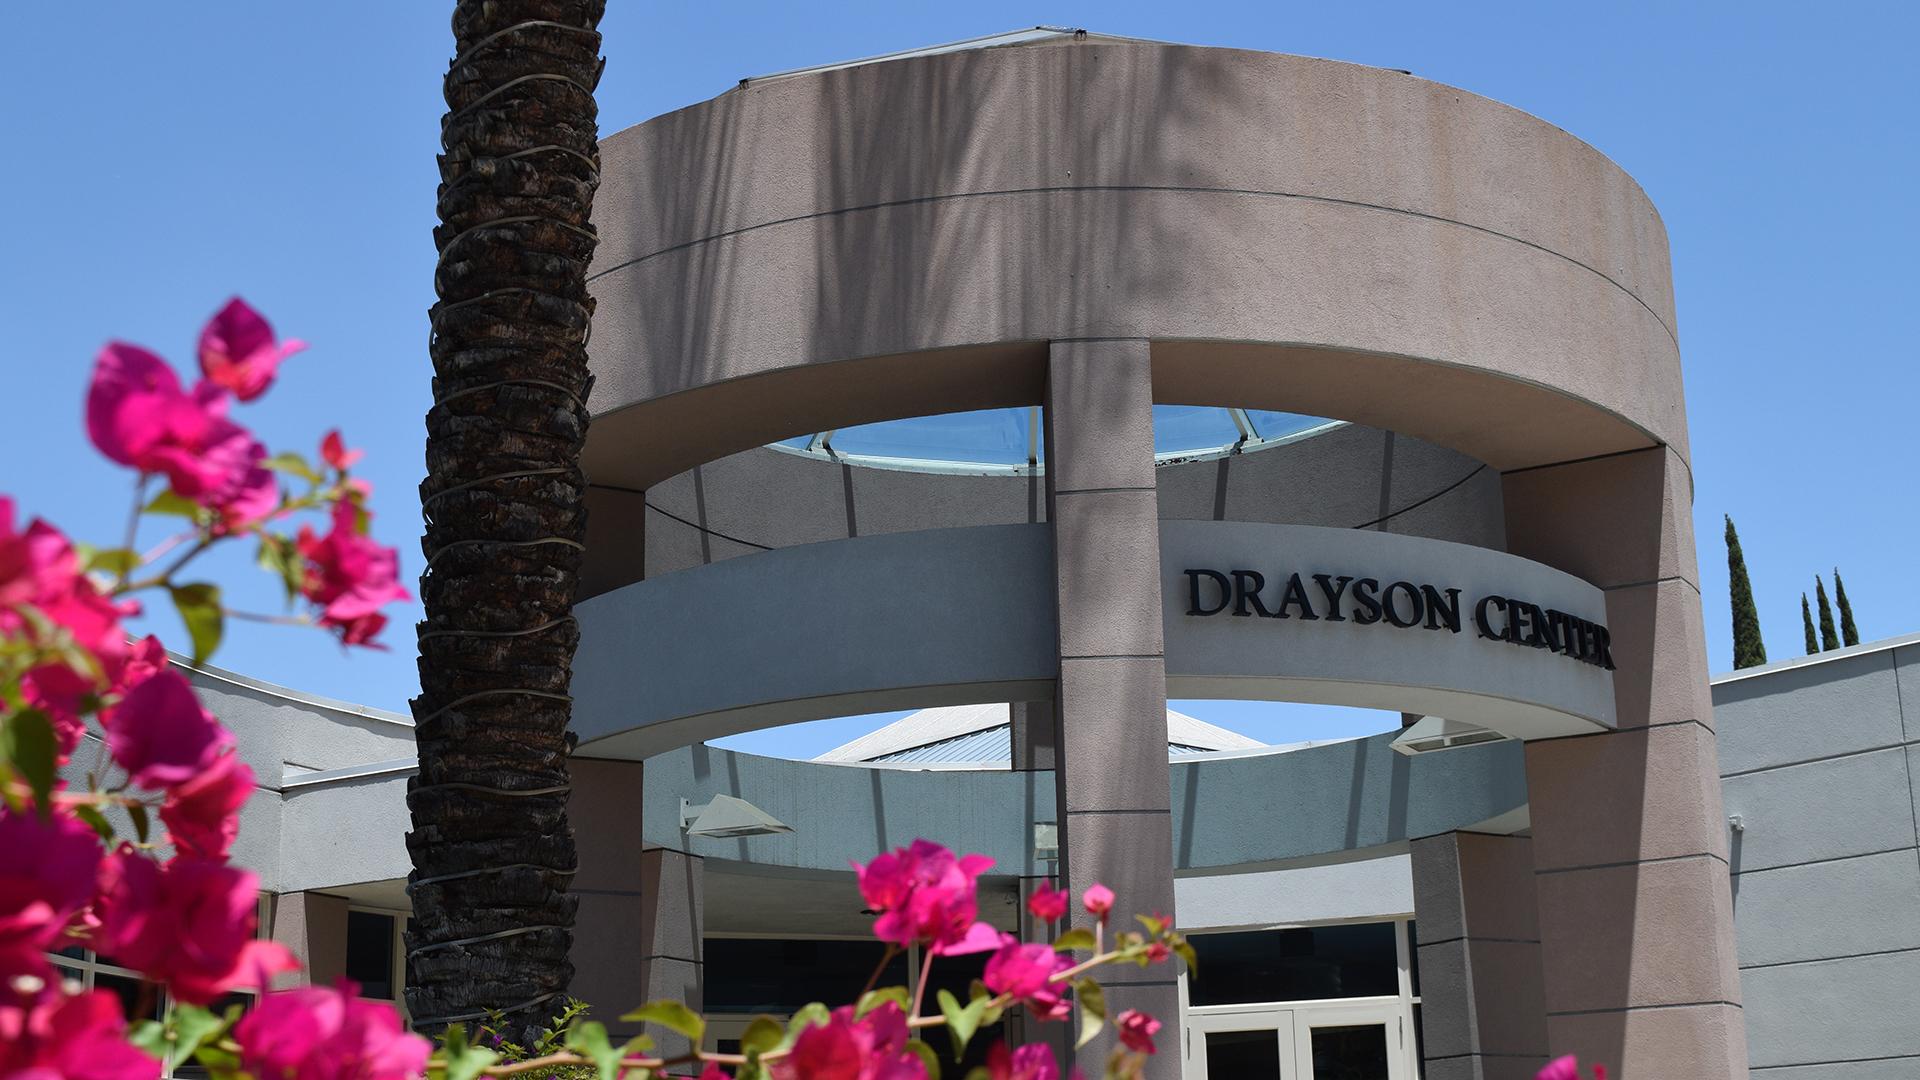 Drayson Center front entrance